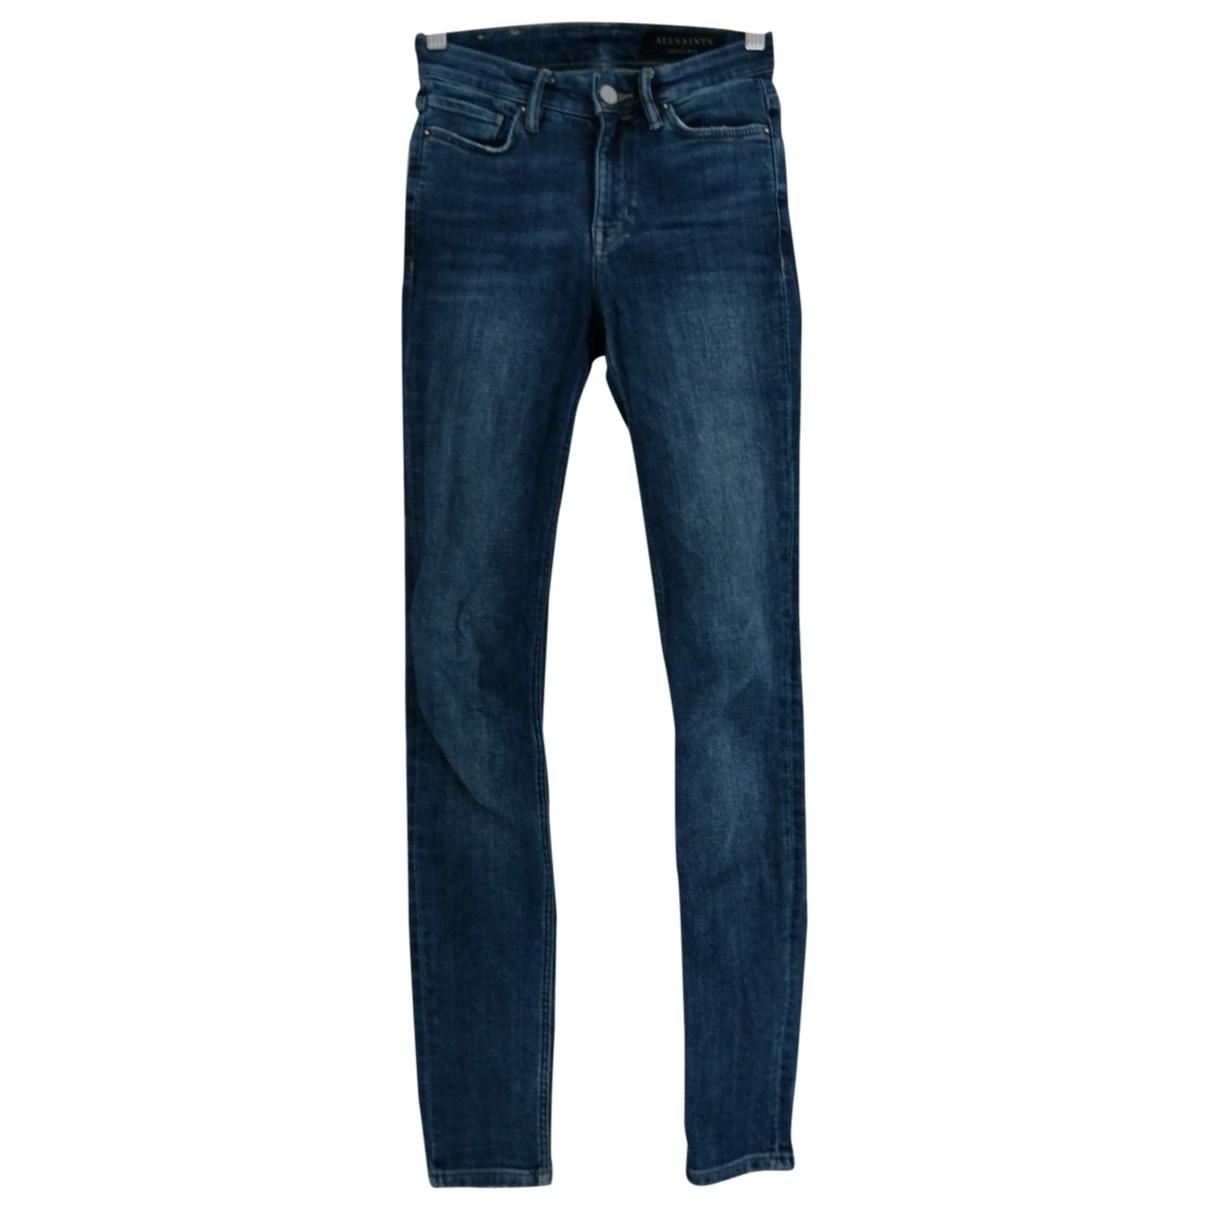 All Saints \N Blue Denim - Jeans Jeans for Women 24 US